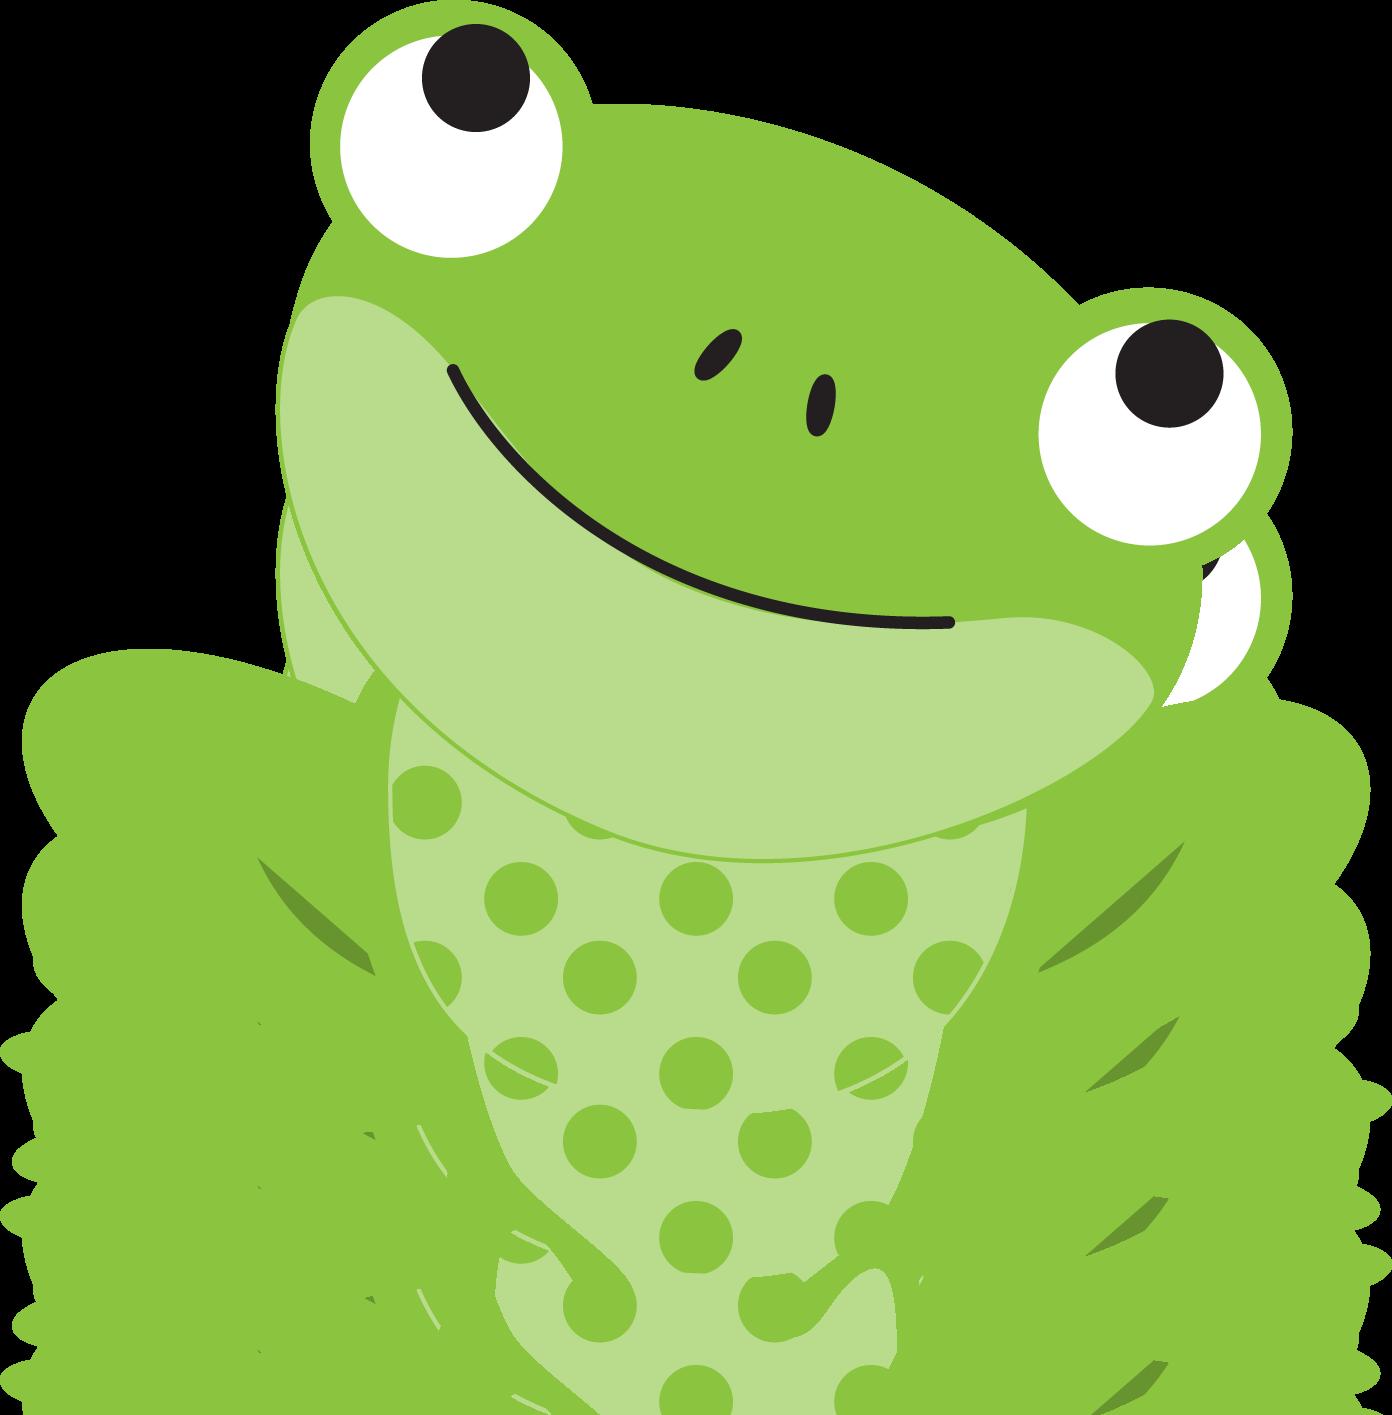 The Tree Frog Clip art.